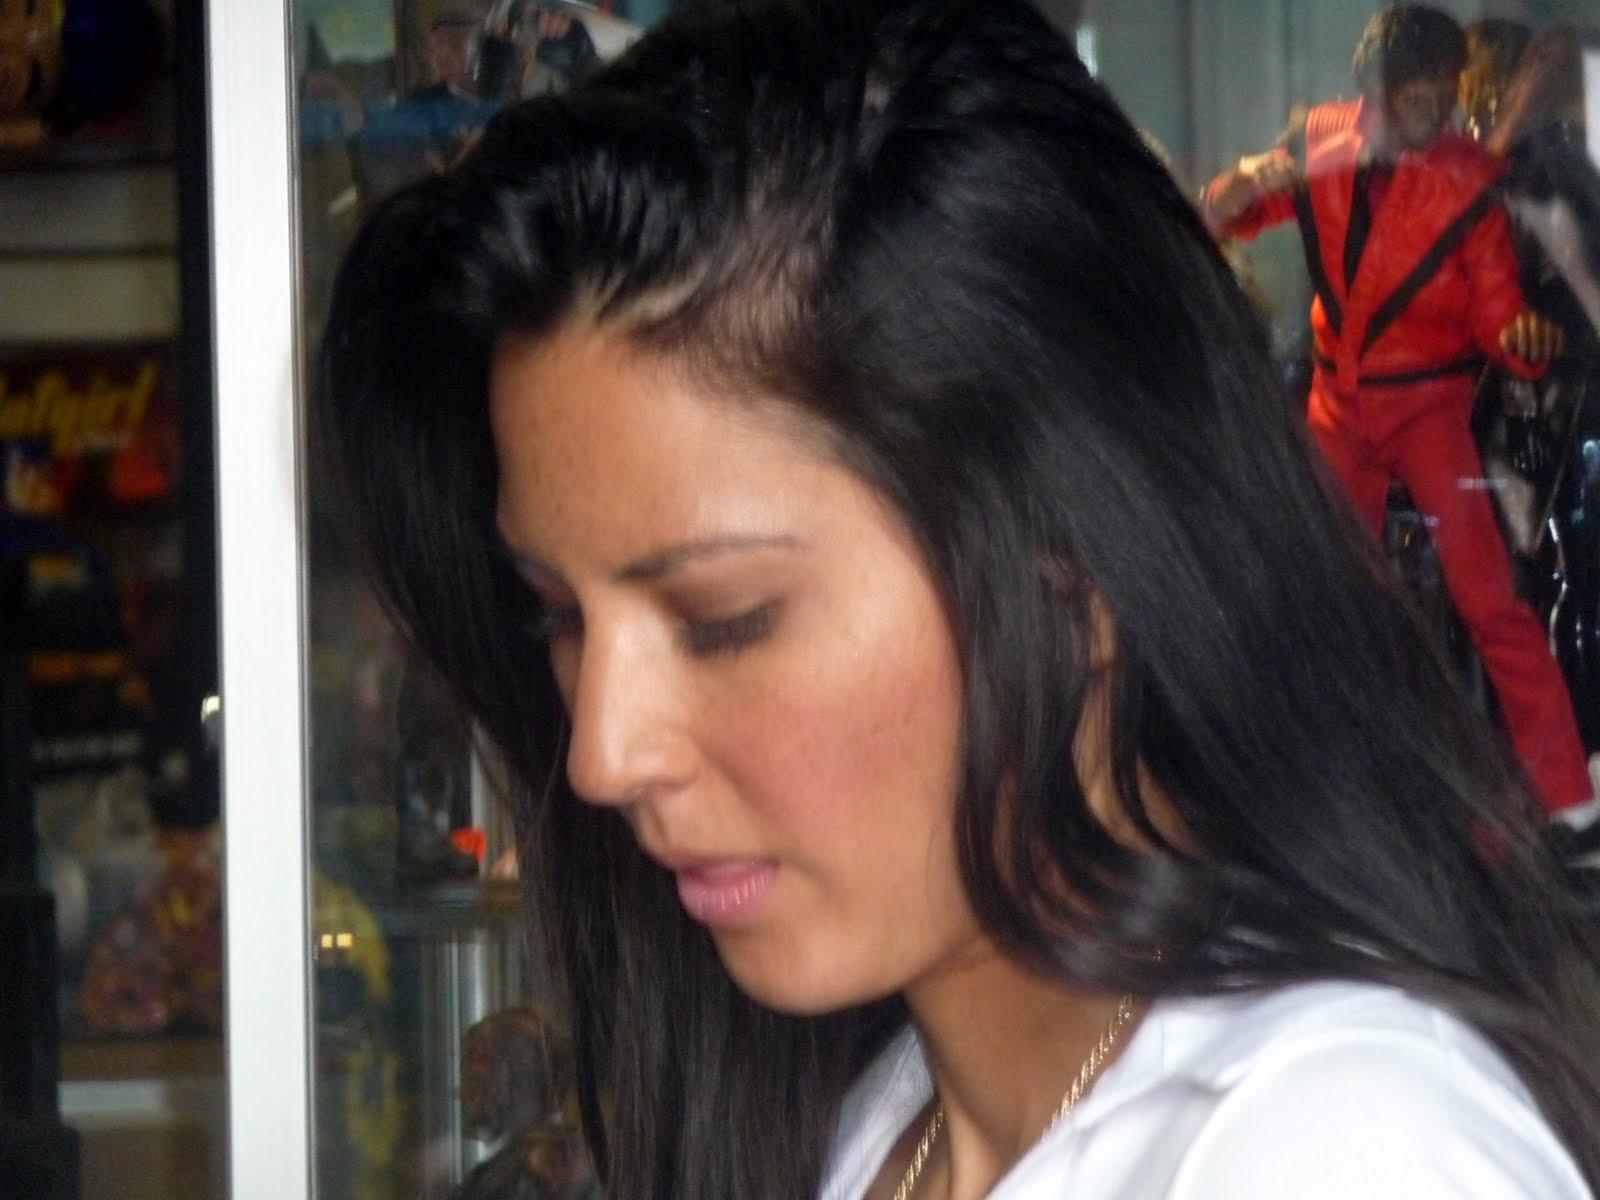 http://2.bp.blogspot.com/_4r9XcWo8Xgk/S8NeNCPcBfI/AAAAAAAAFyE/RI6bOQ1G69w/s1600/Olivia%2BMunn-%2BOMFG%2B4-11-10%2B016.jpg